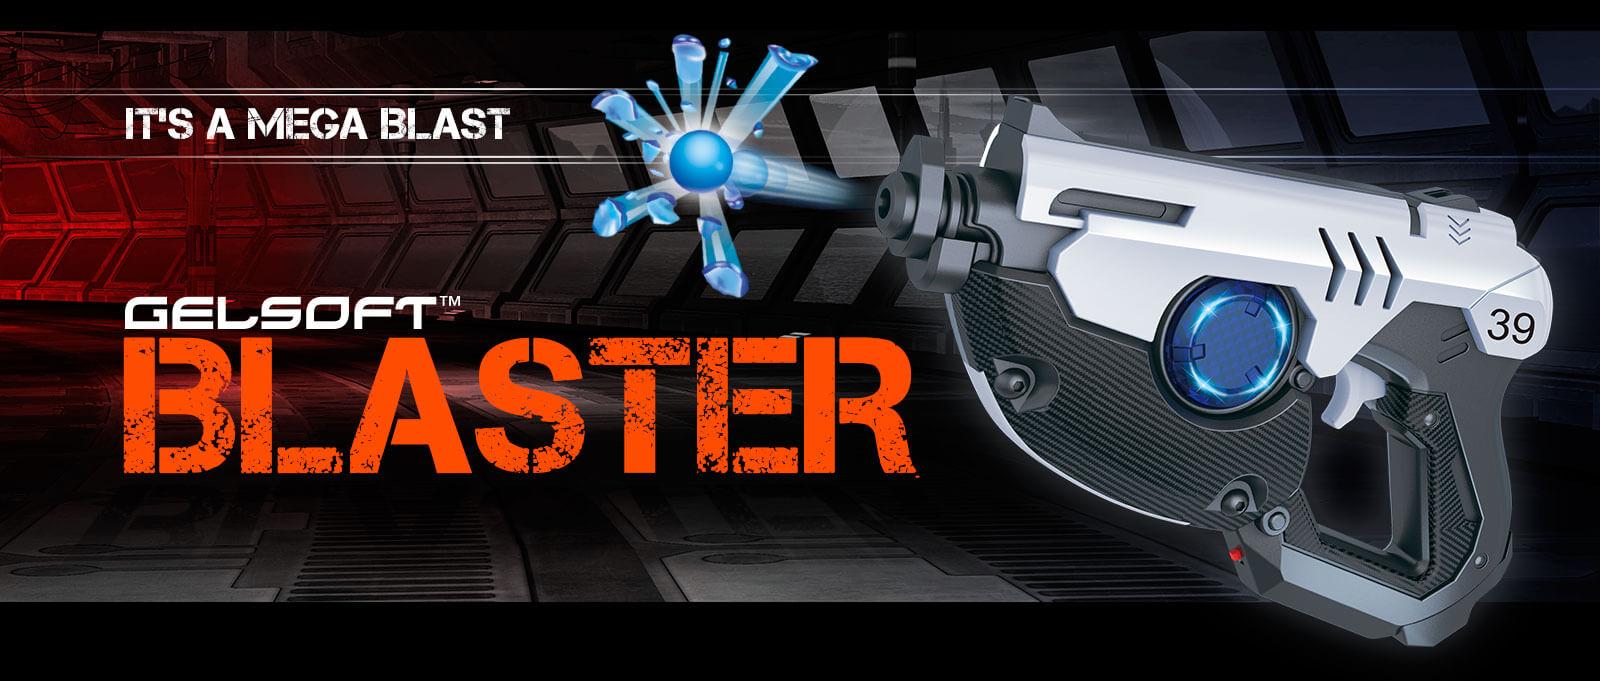 gelsoft blaster banner link